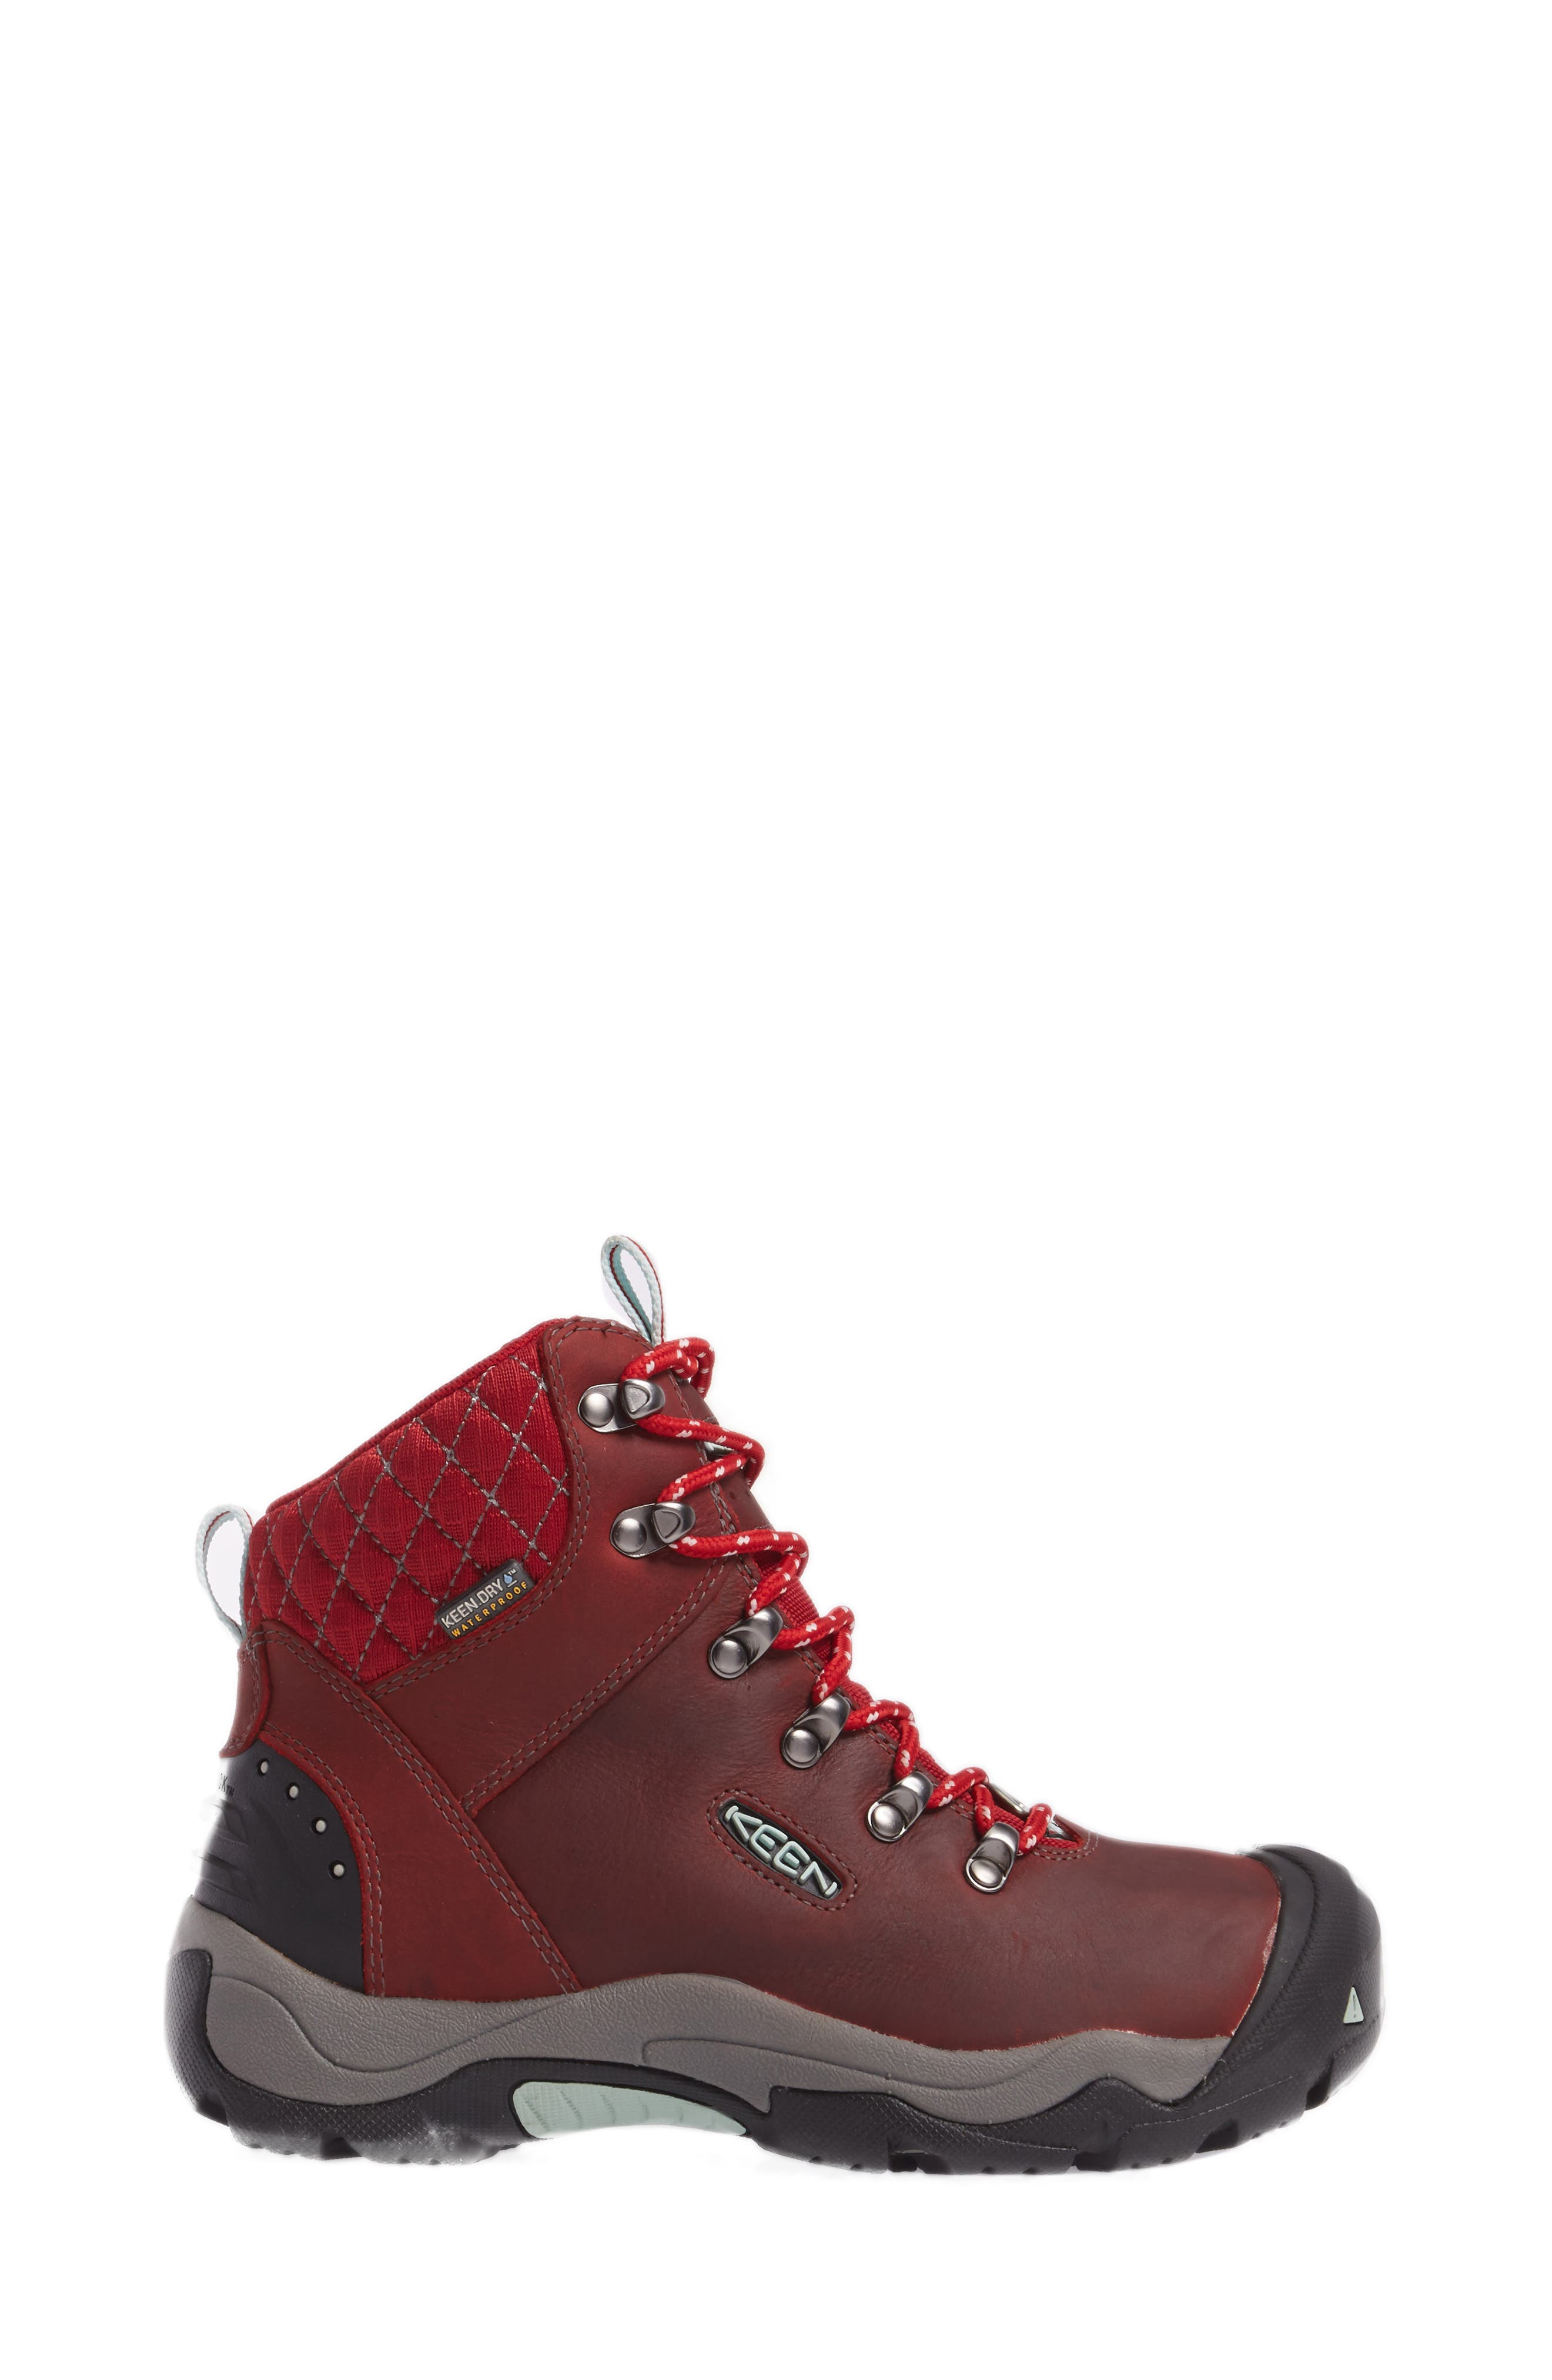 Revel III Waterproof Hiking Boot,                             Alternate thumbnail 6, color,